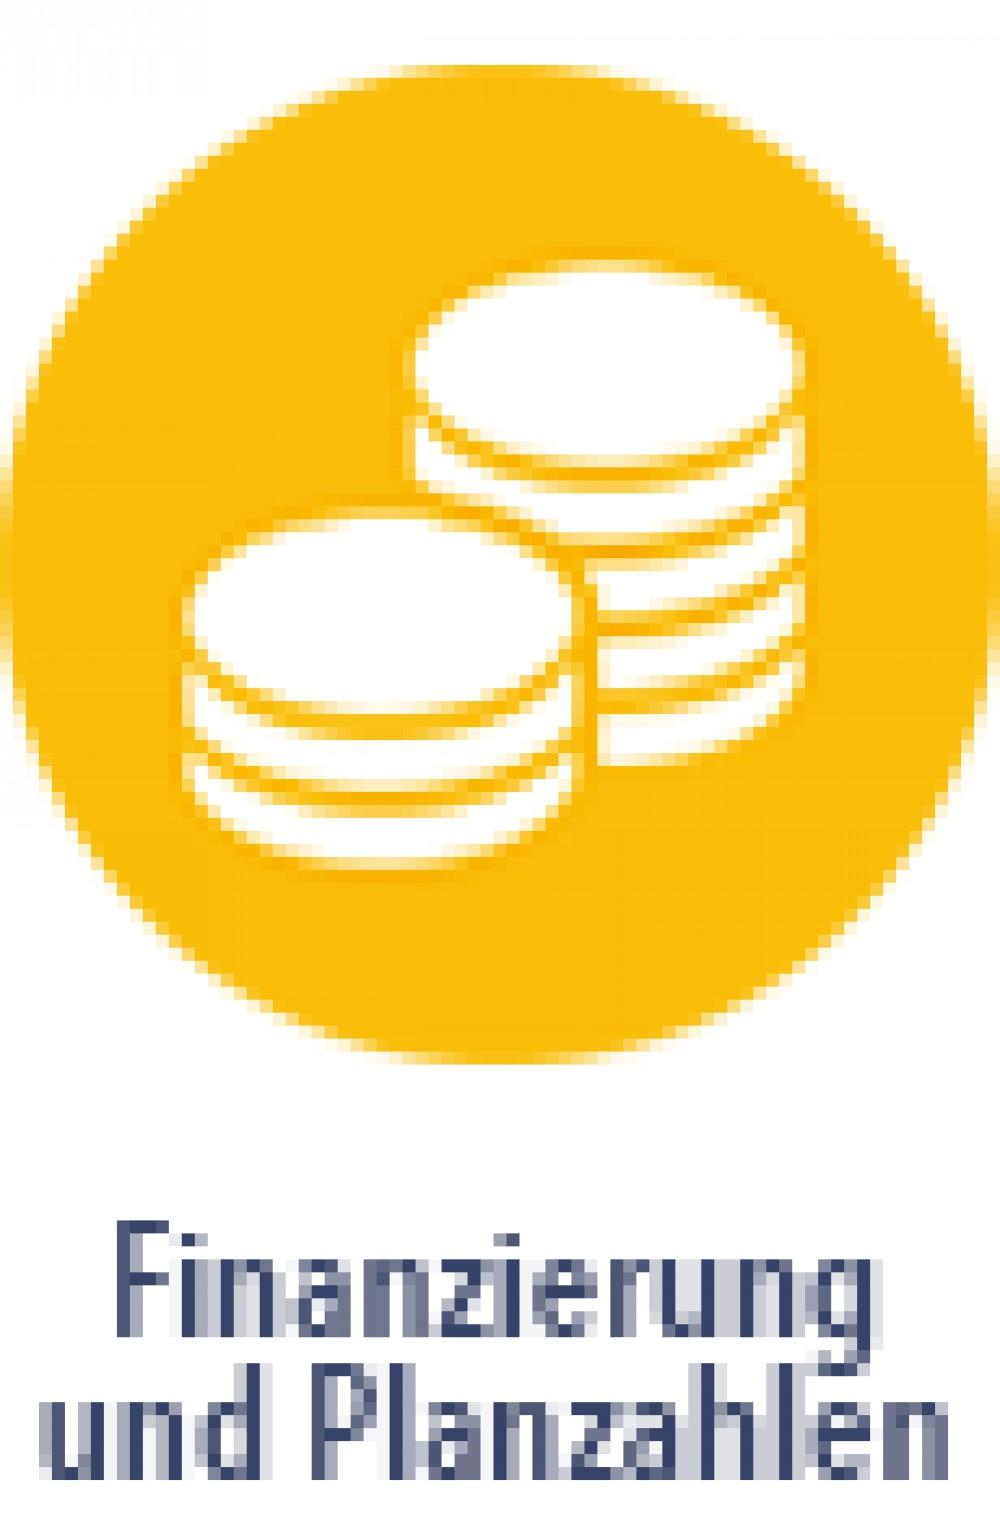 Icon Finanzierung frizle fresh foods AG